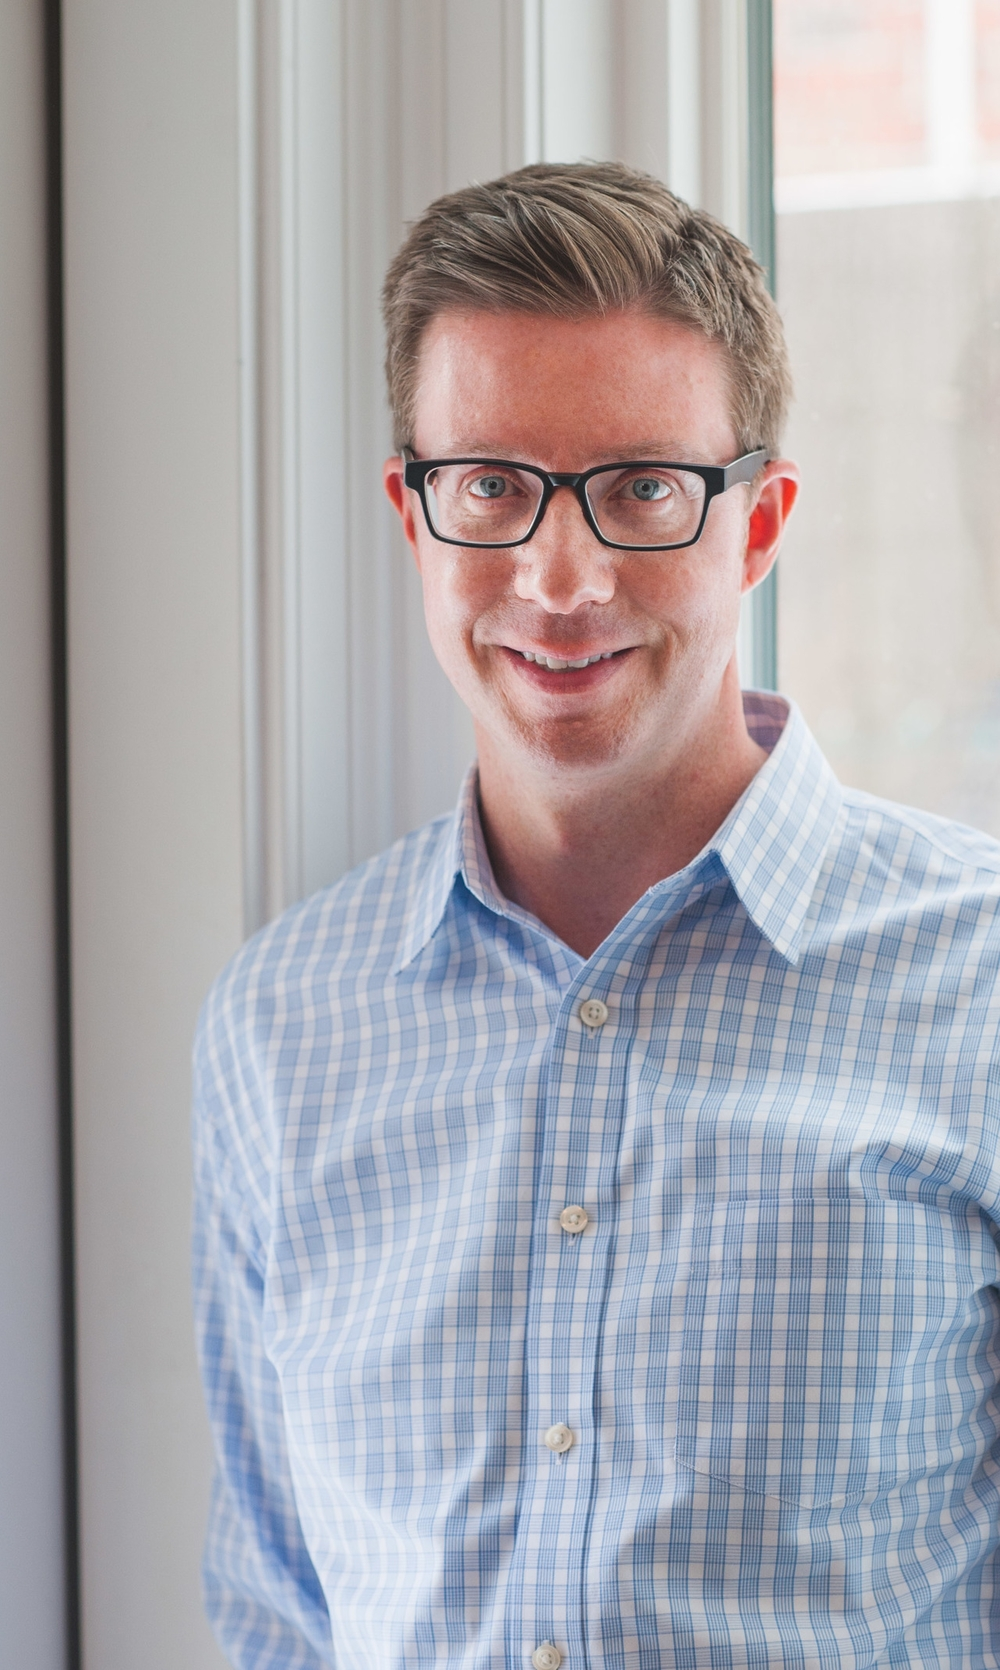 Ryan Connolly / RE Salesperson